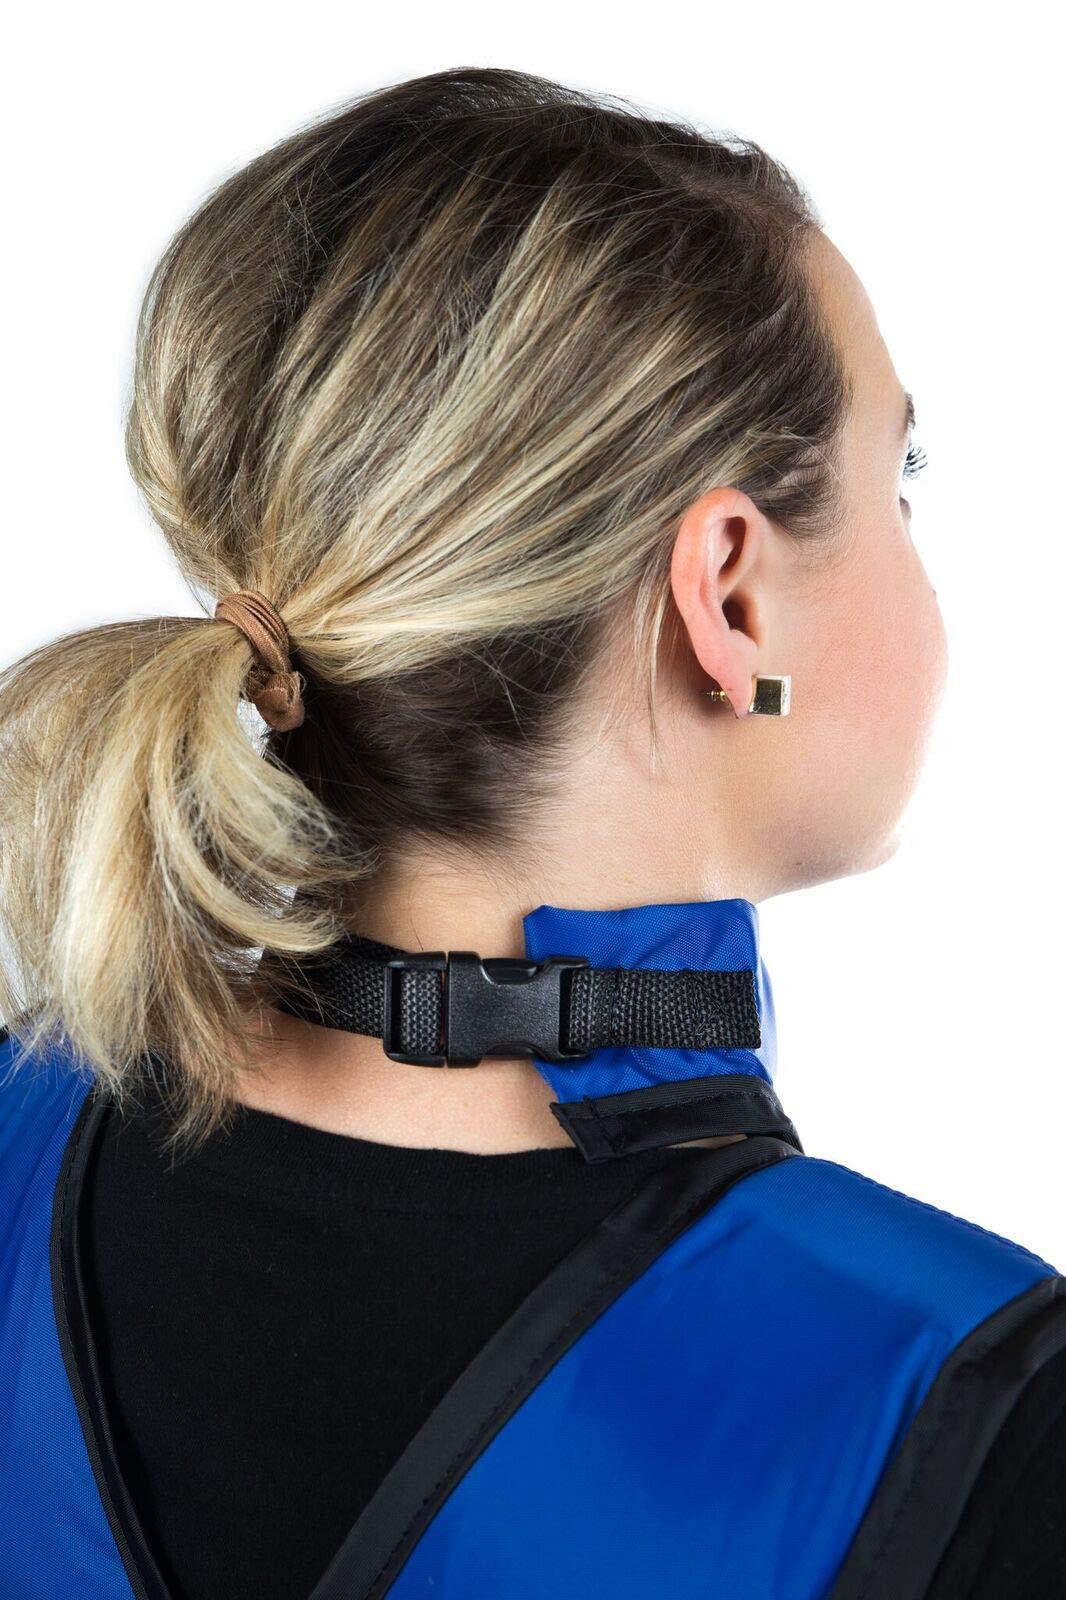 Standard No-Binding Thyroid Collar w/Buckle Closure, Regular Lead, 0.5mm Pb Lead Equivalency, Forest